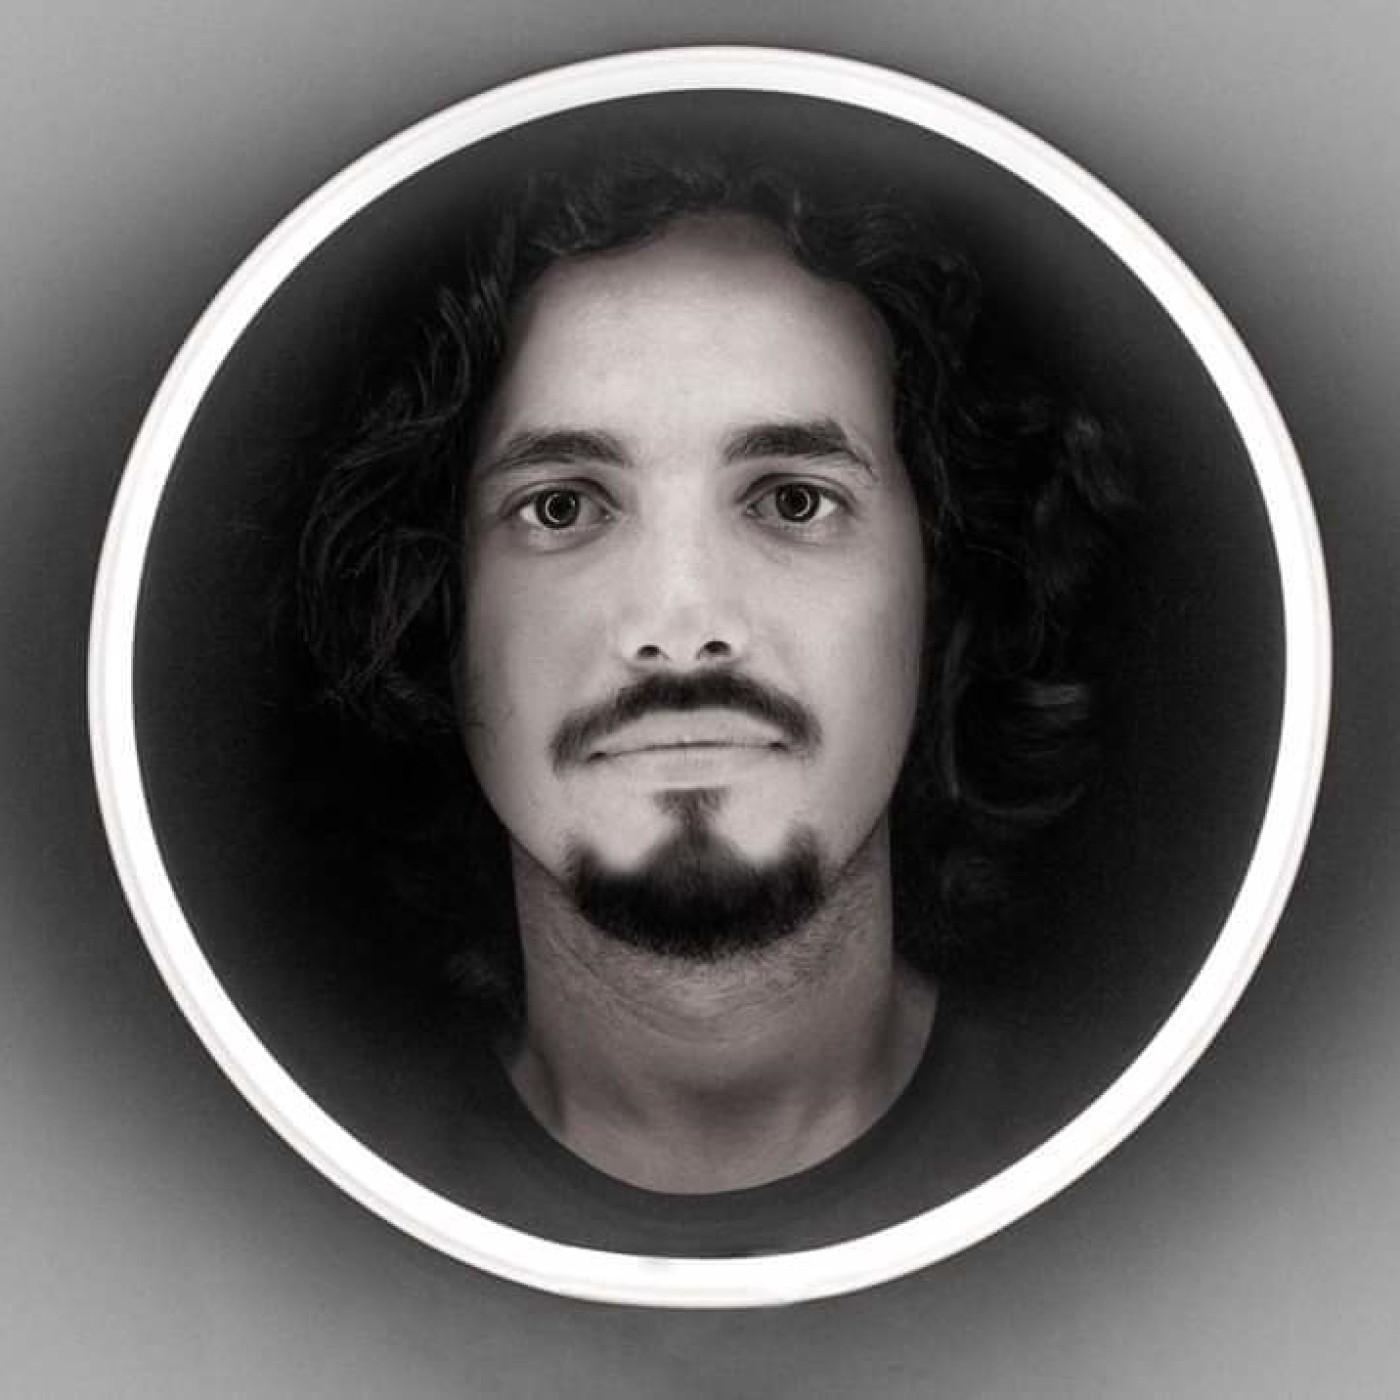 213Rock Podcast Harrag Melodica itw with Rak Fahem Blogger 26 02 2020